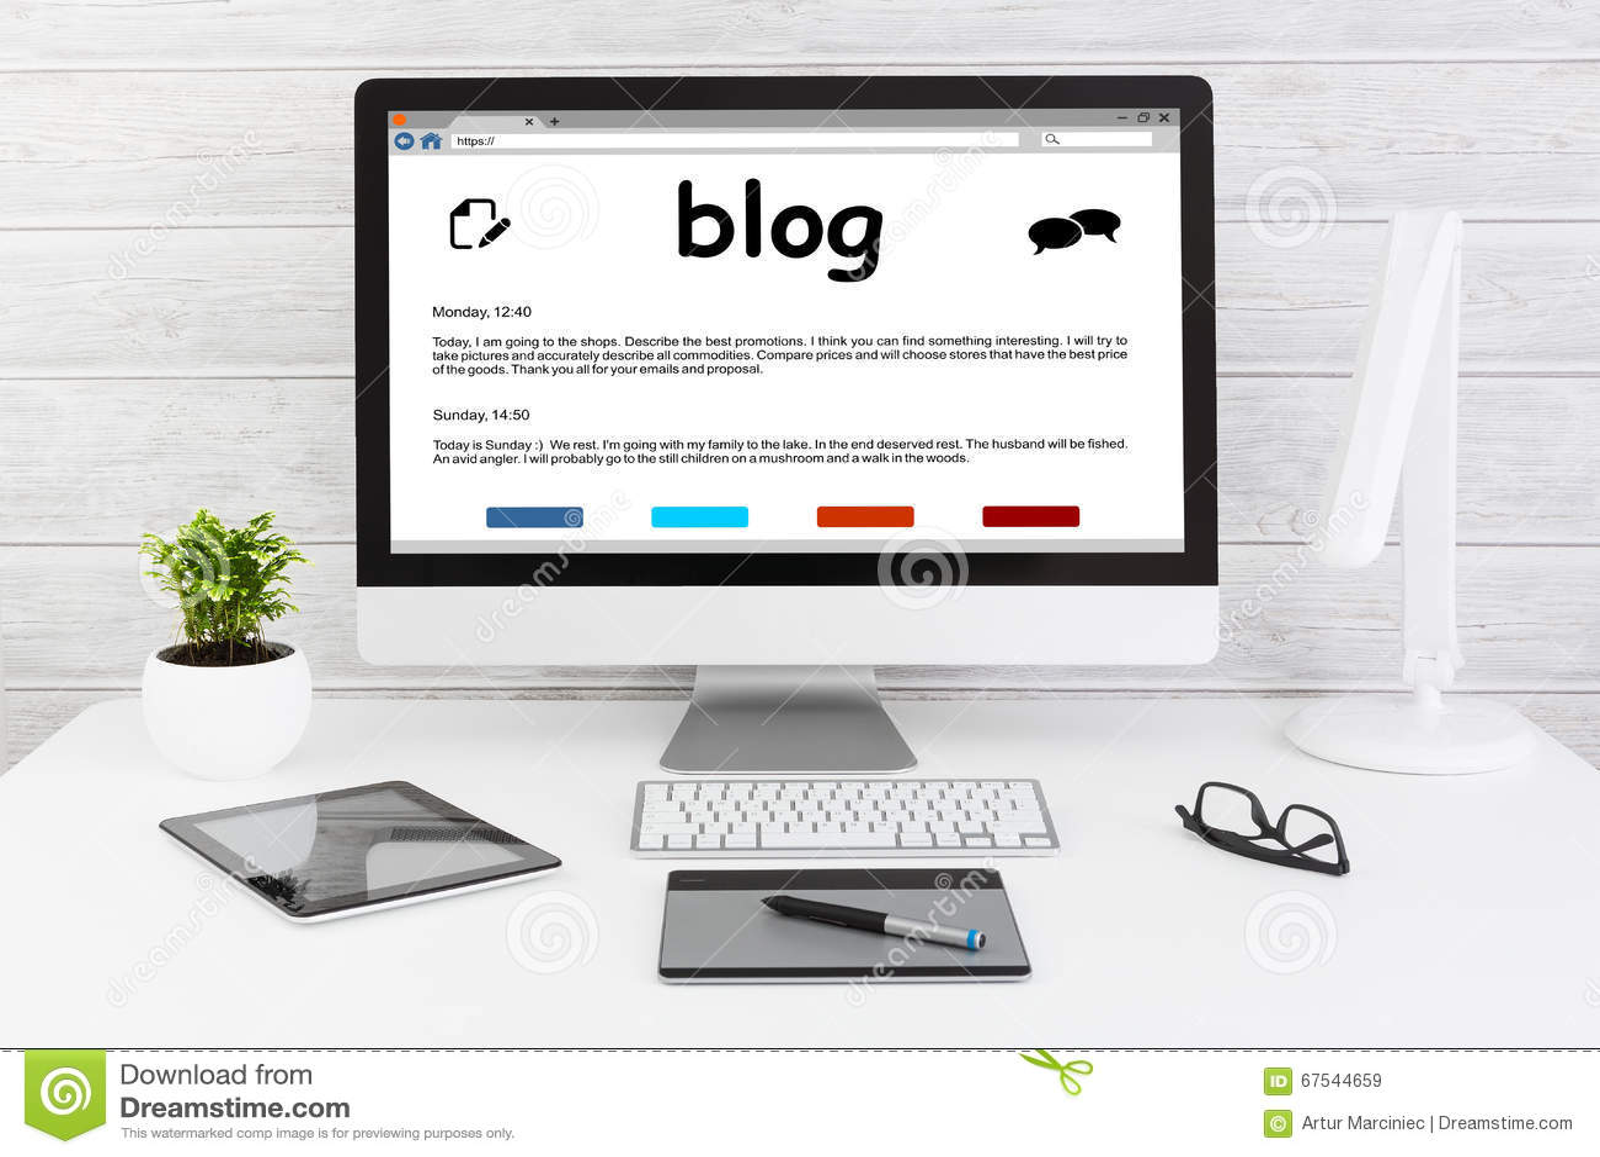 Blog Weblog Media Digital Dictionary Online Concepts  Stock Image